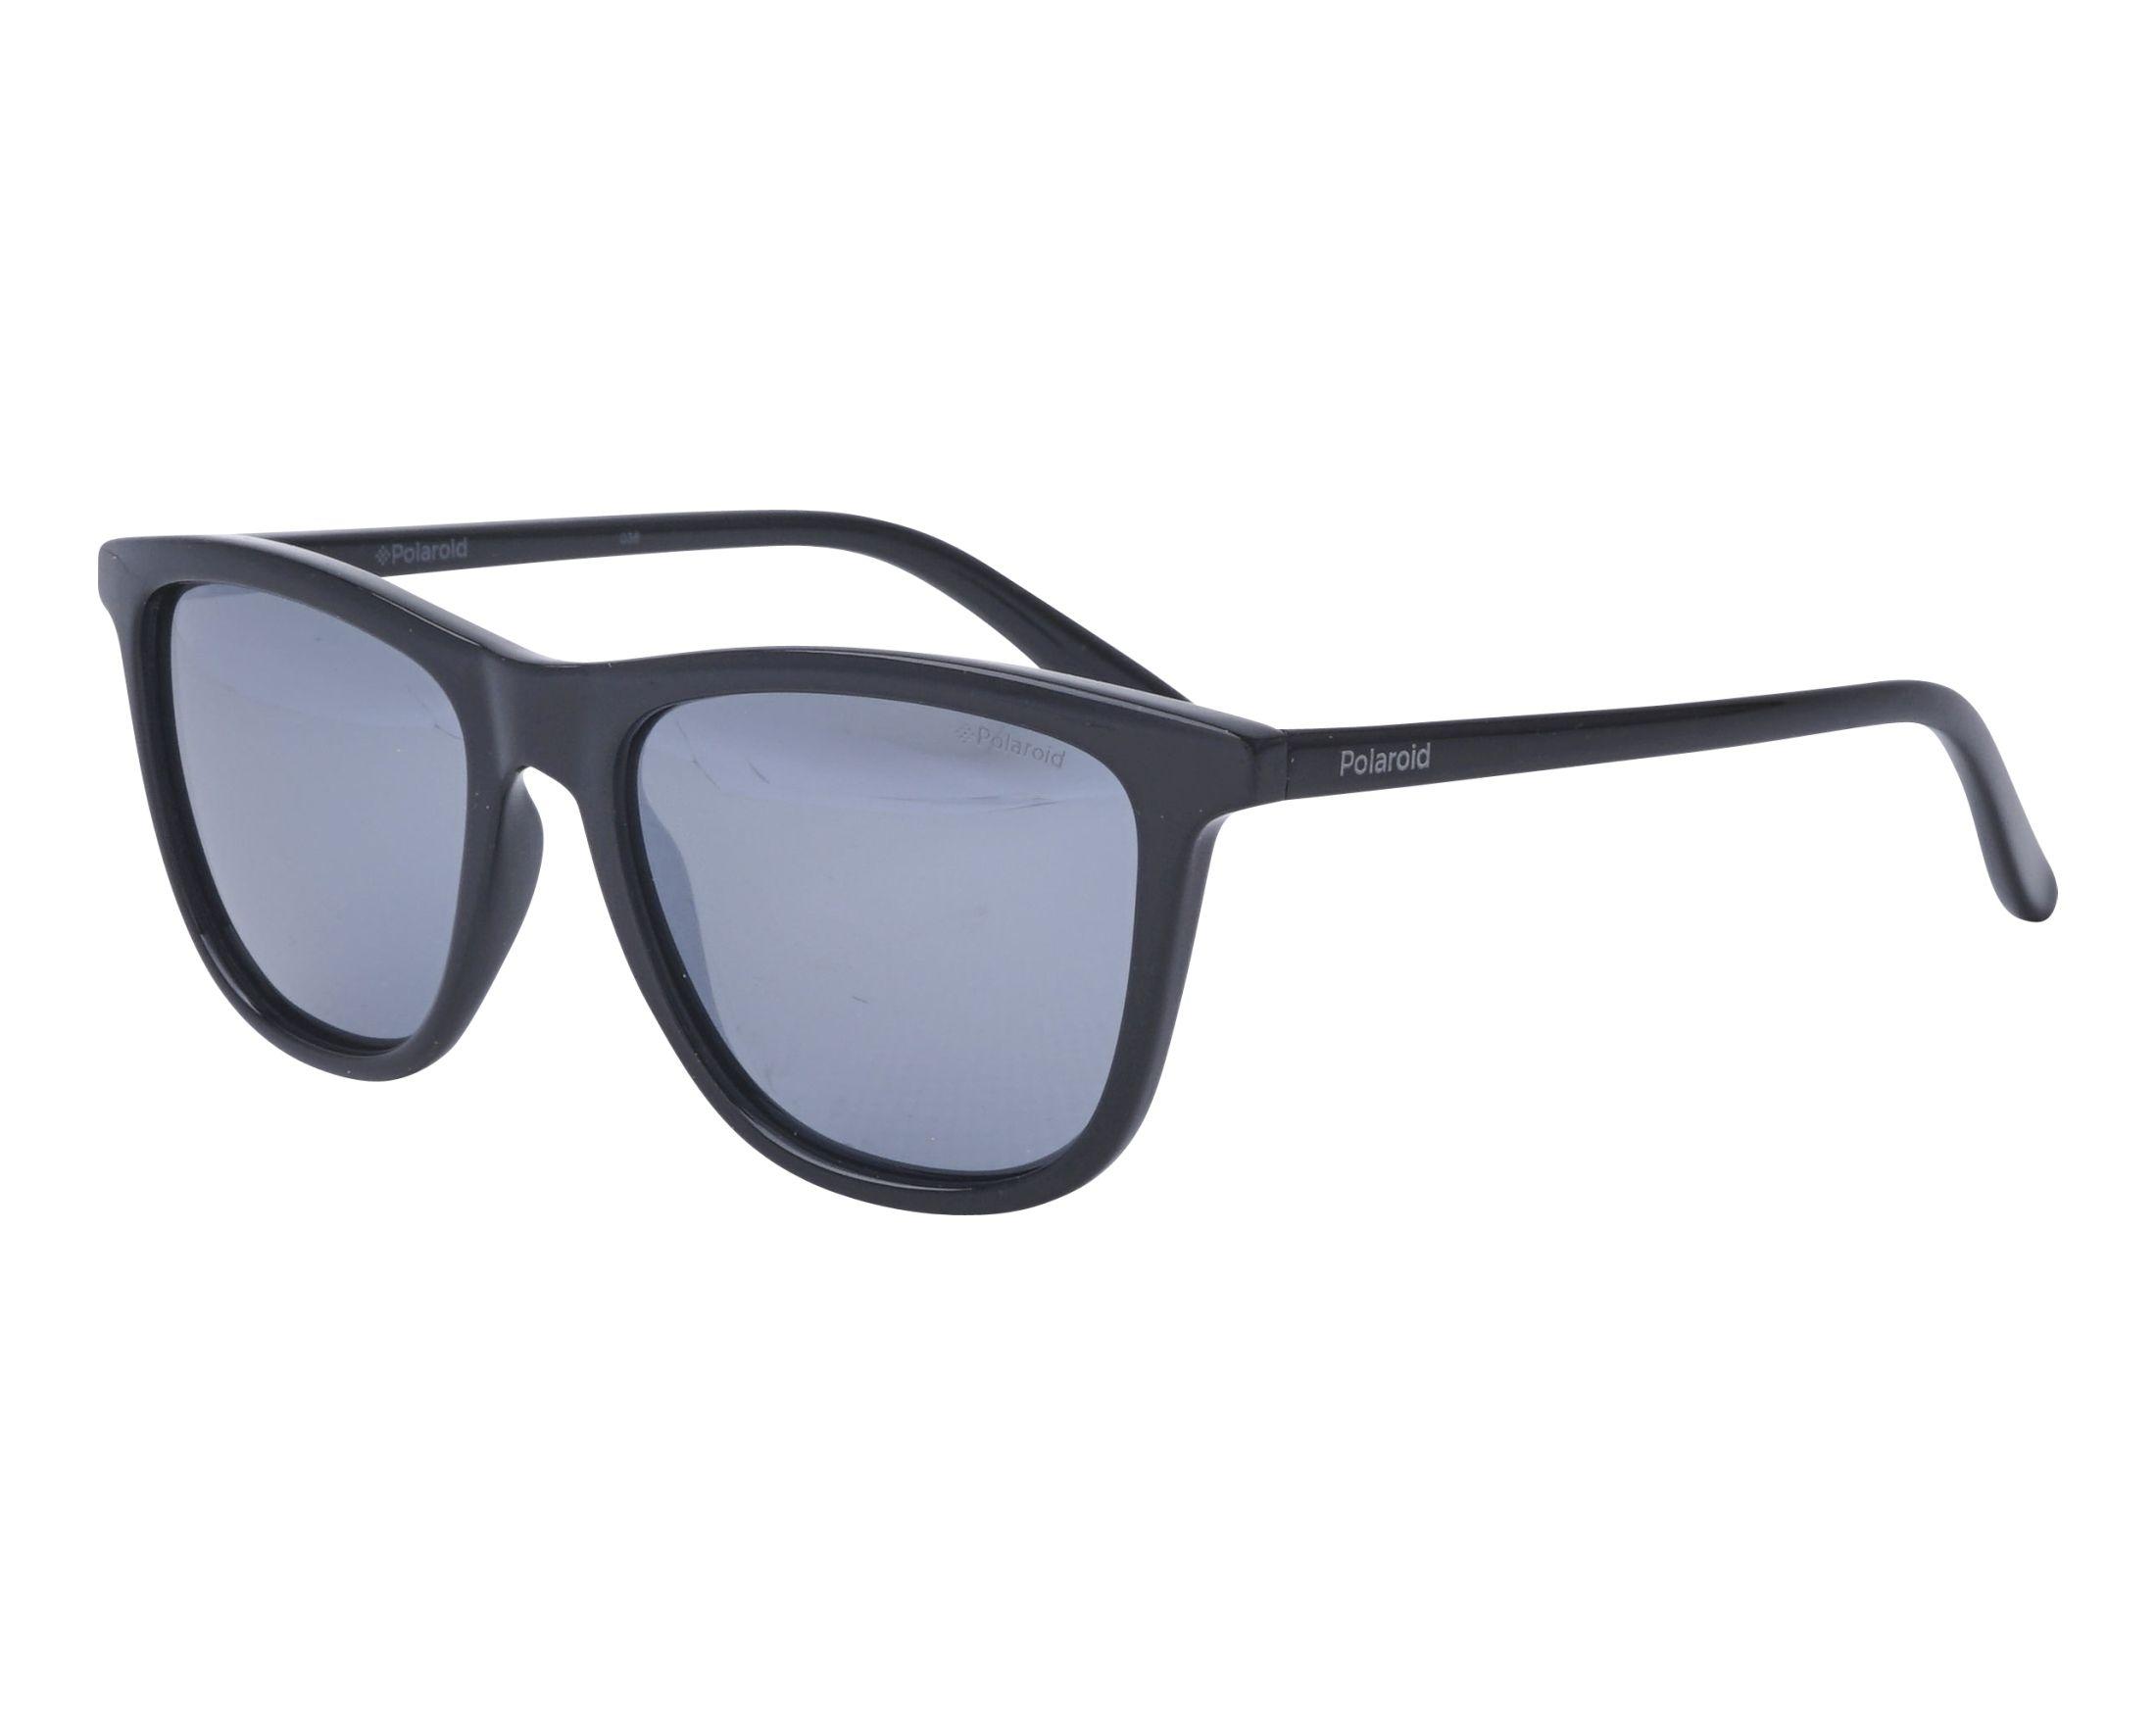 f06ace075c Sunglasses Polaroid PLD-8027-S 807EX 47-15 Black profile view